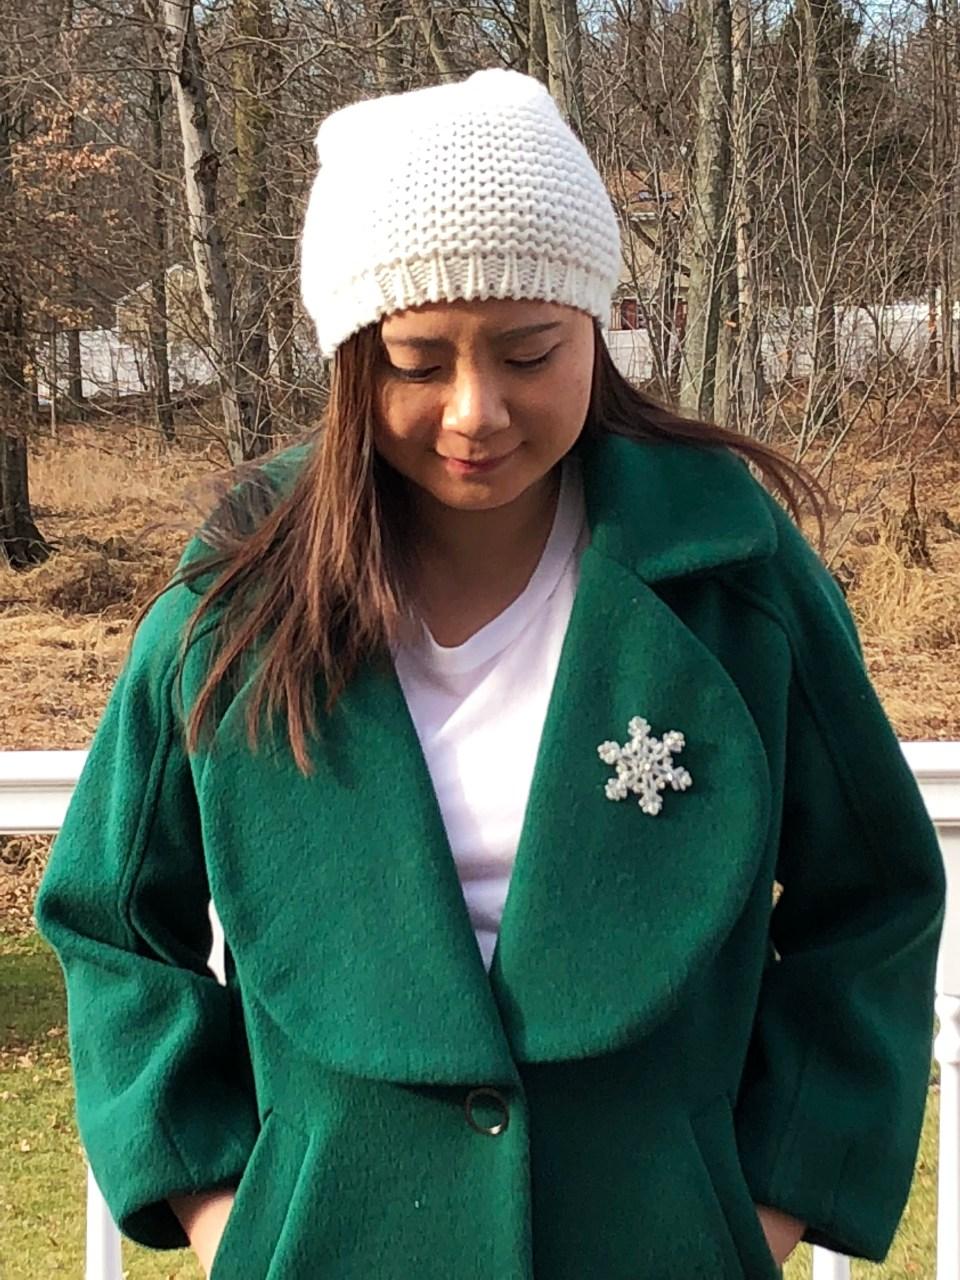 Green Lapel Coat + Snowflake Brooch 3